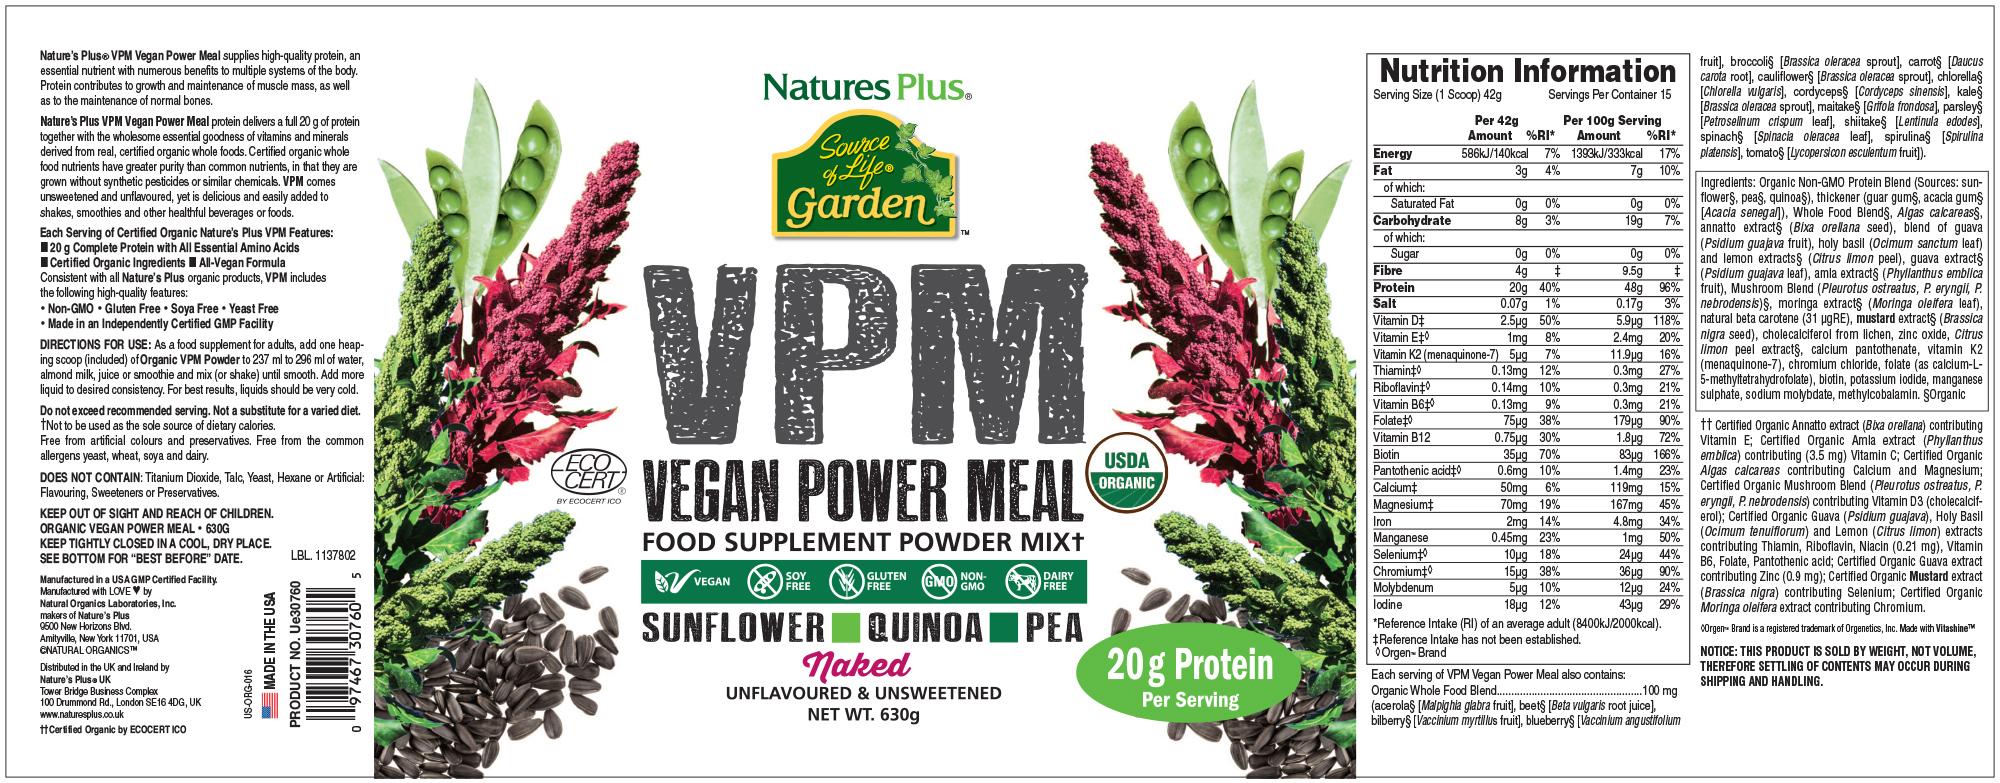 Natures Plus, Source of Life Garden, VPM Vegan Power Meal